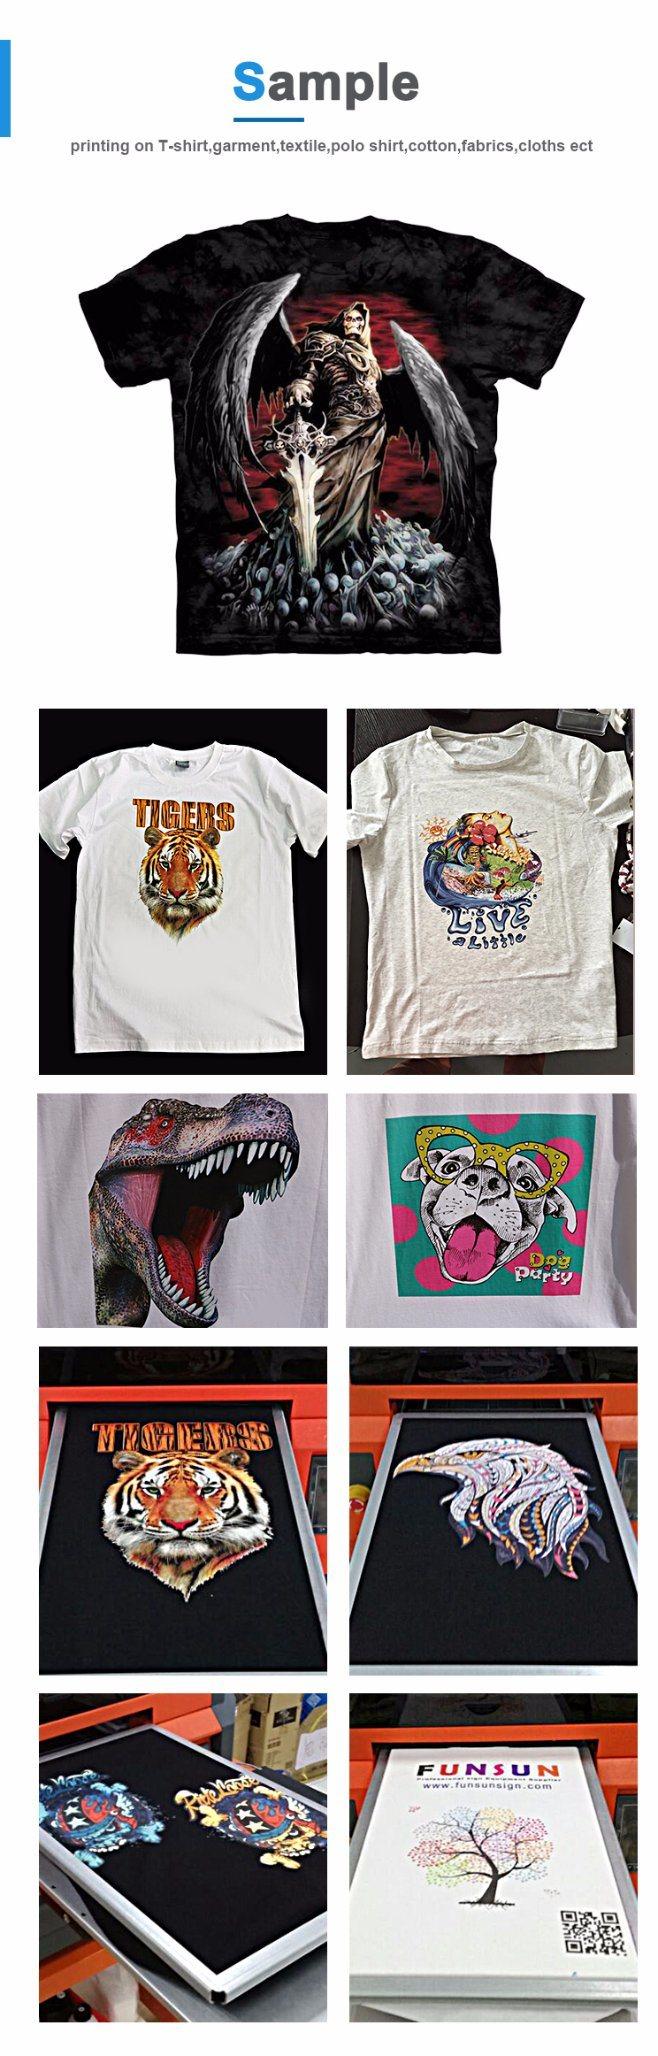 b02d2f194 T Shirts Design Printing Machine - DREAMWORKS